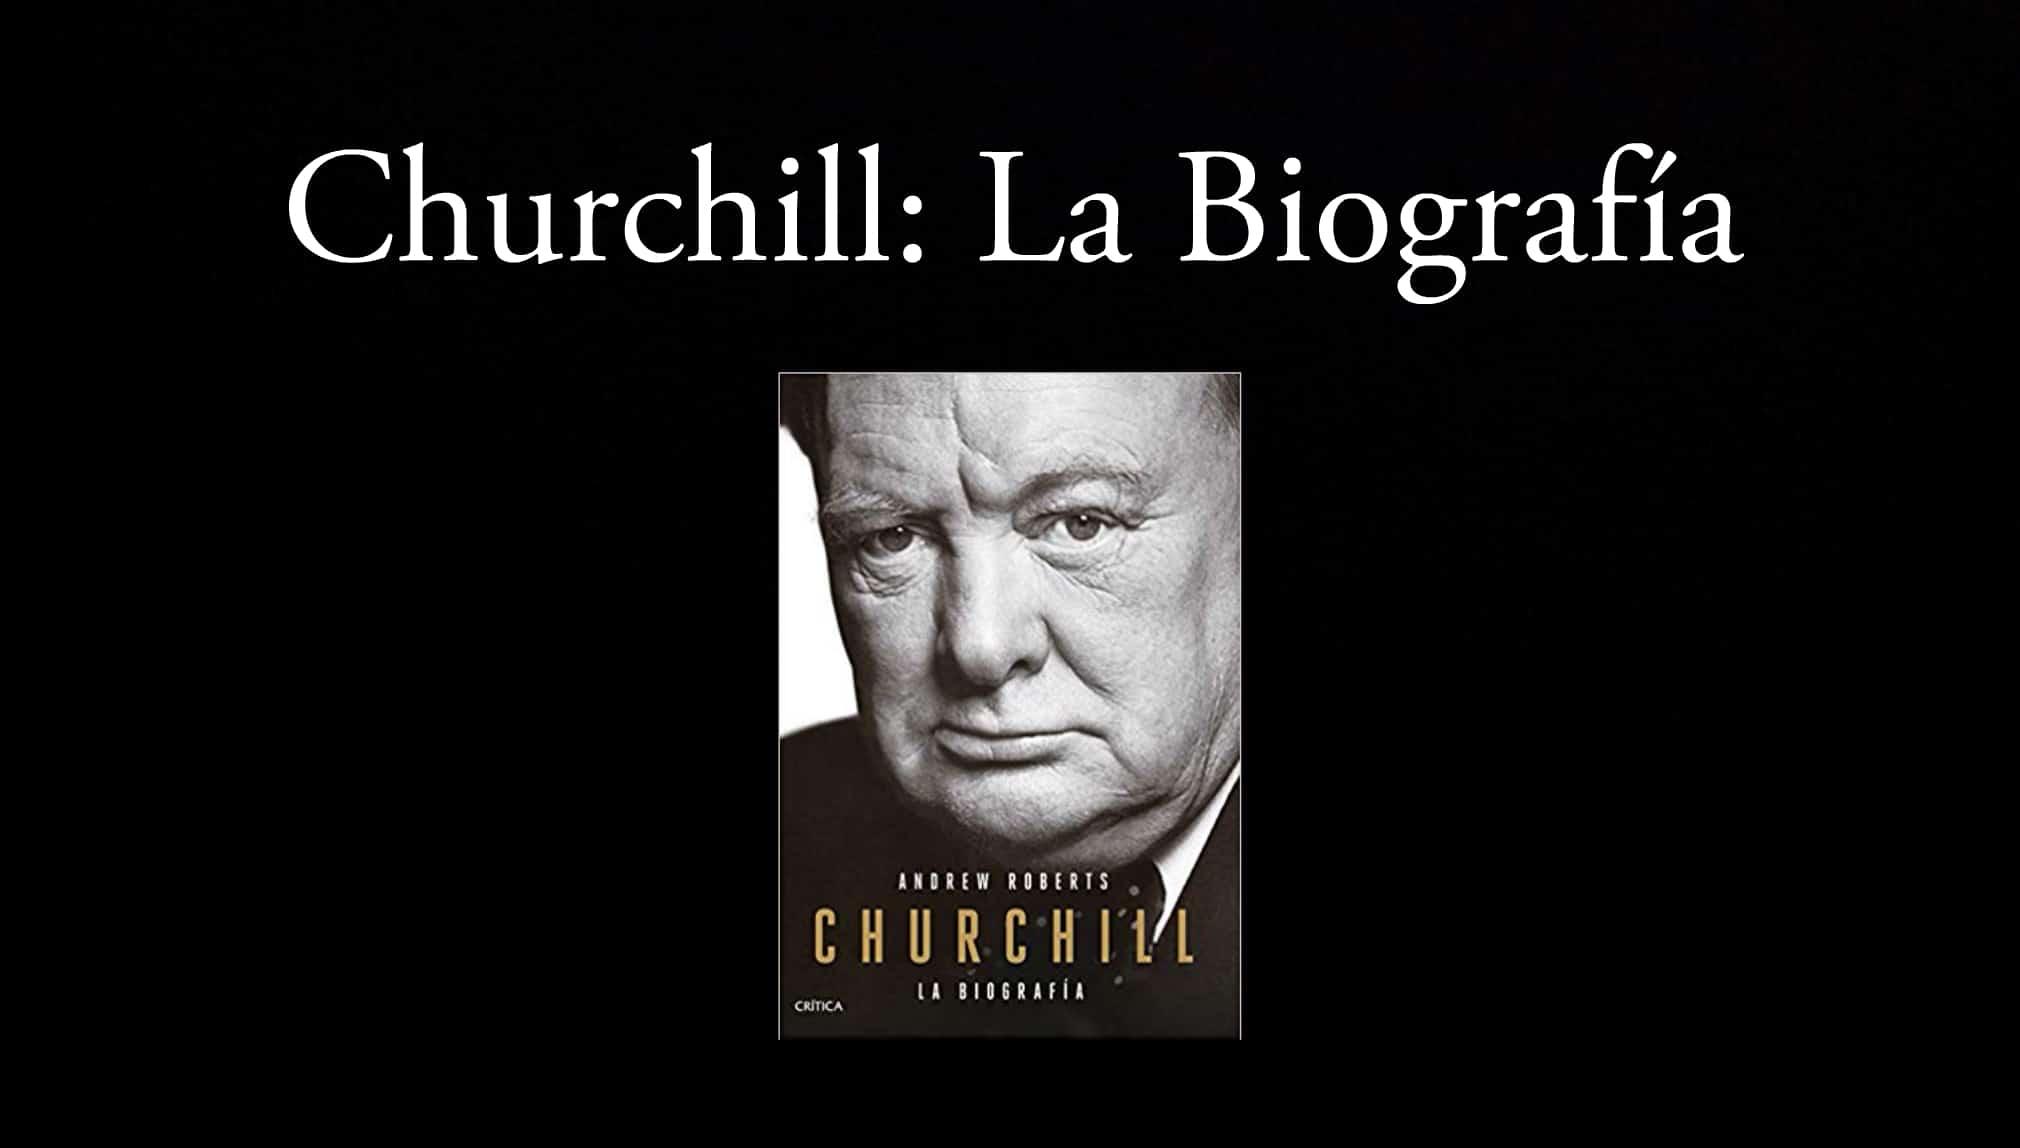 Churcill: La biografía.